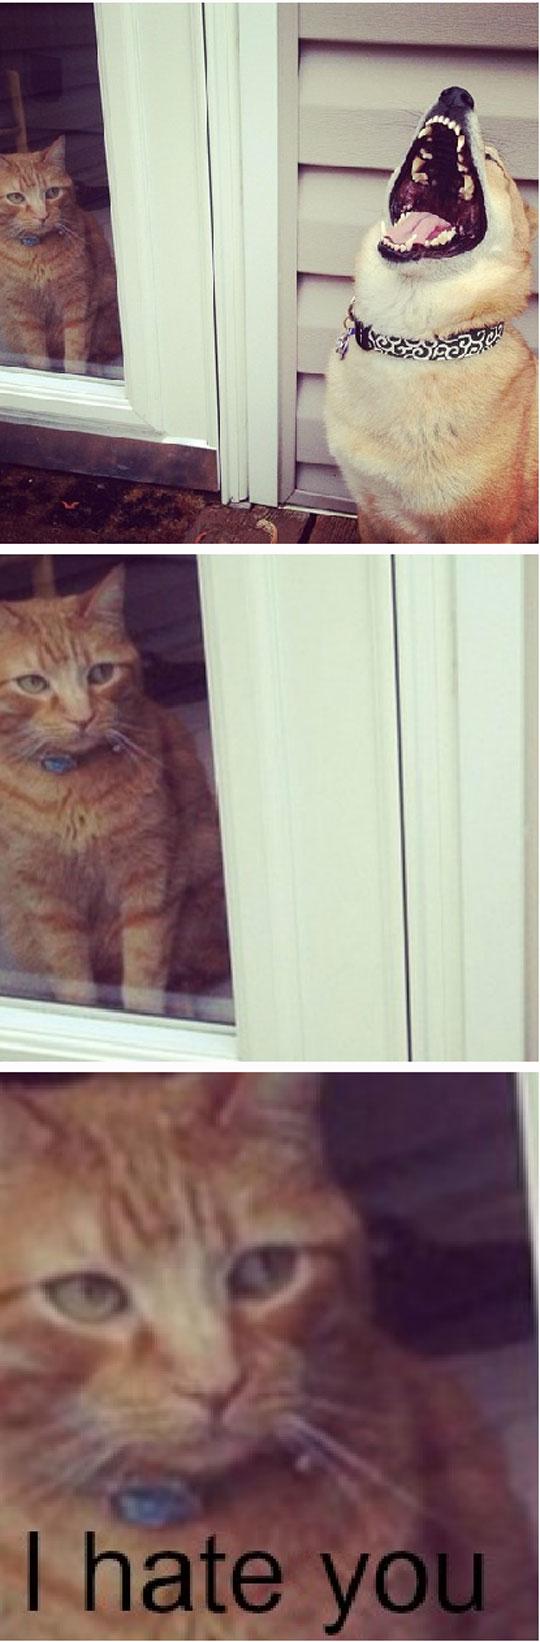 dog, cat, i hate you, outside